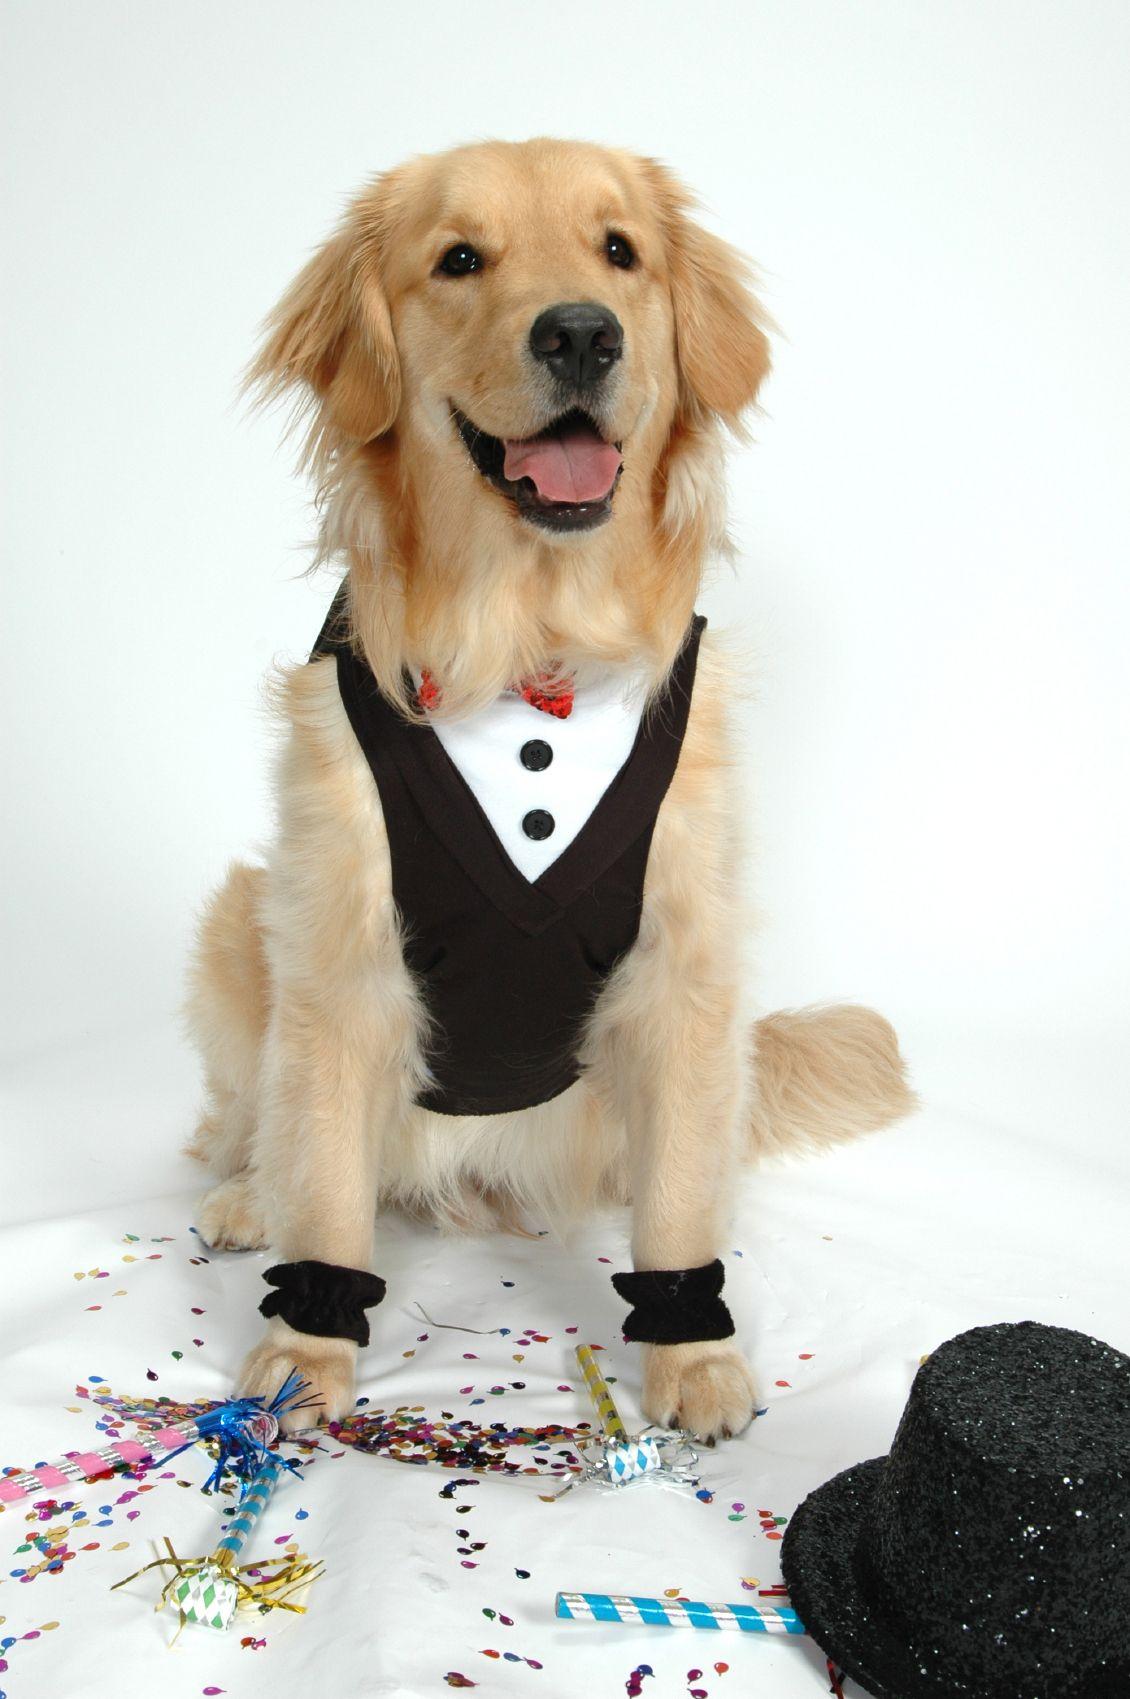 A Veterinarian S Top 10 New Year S Resolutions Puppy Halloween Costumes Pet Halloween Costumes Dog Halloween Costumes